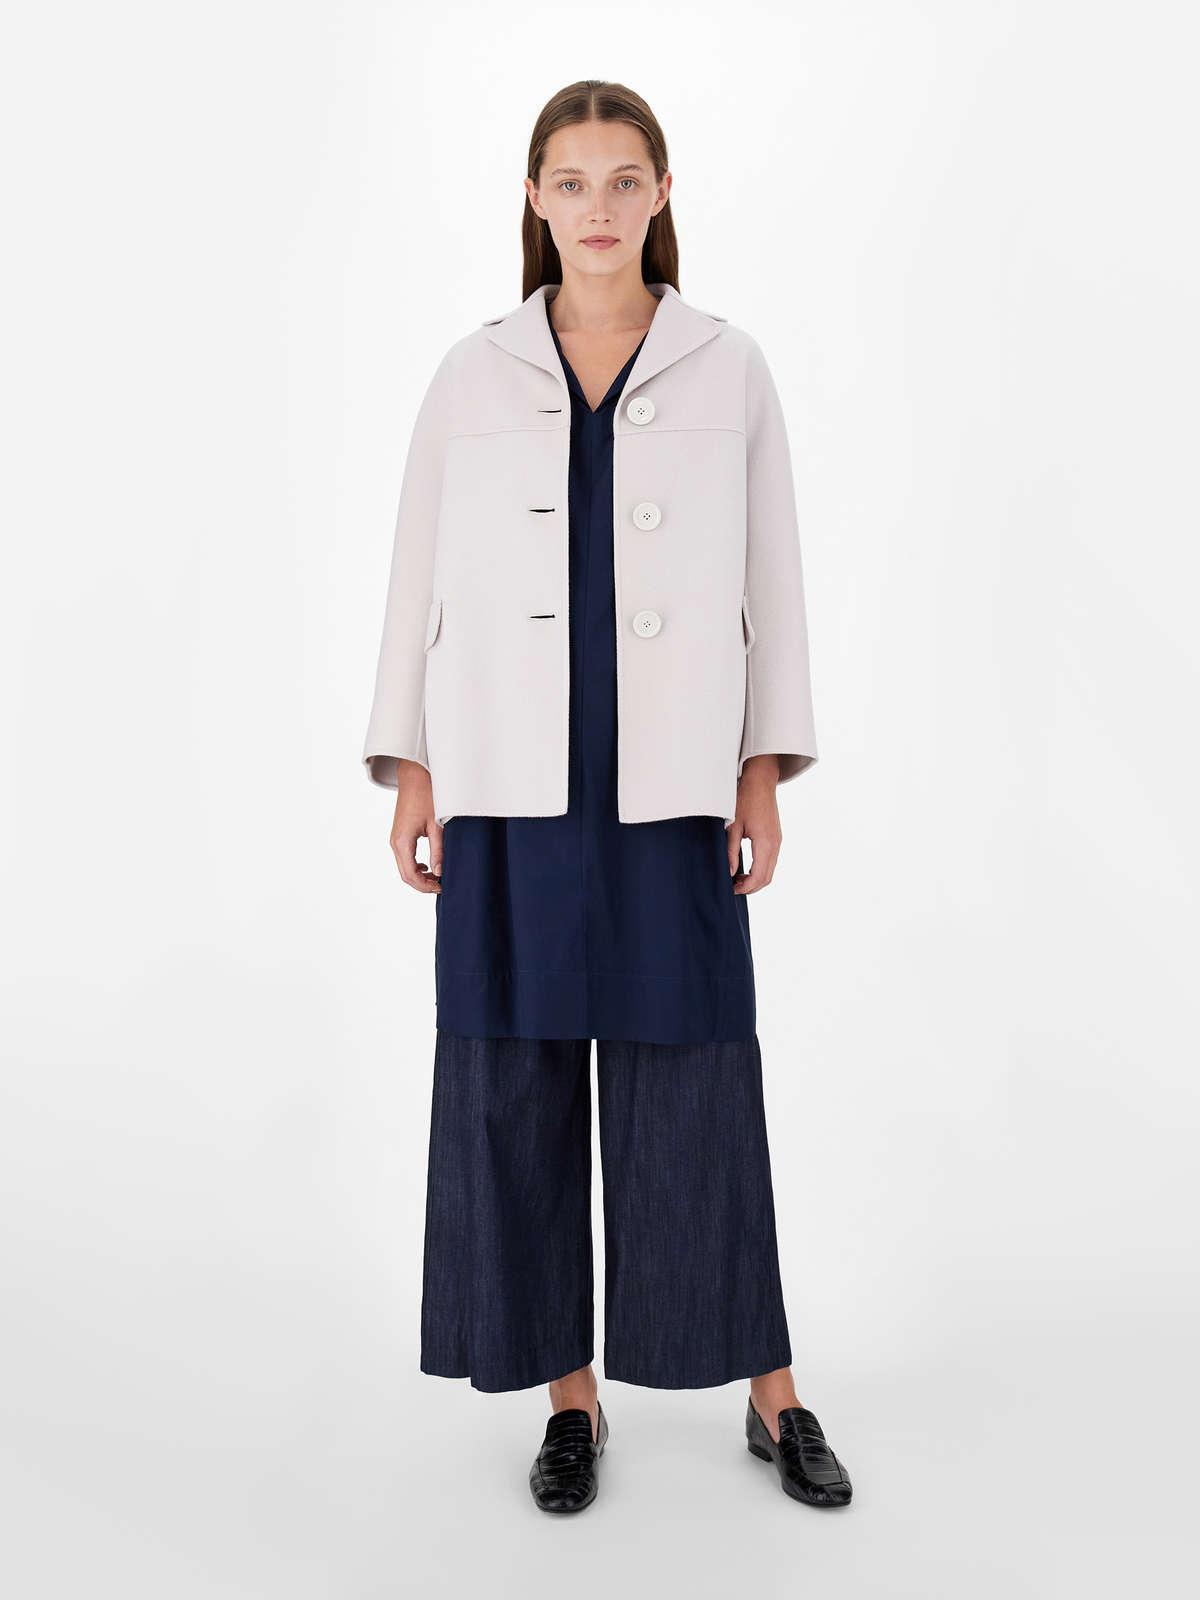 Cotton denim pants - Max Mara